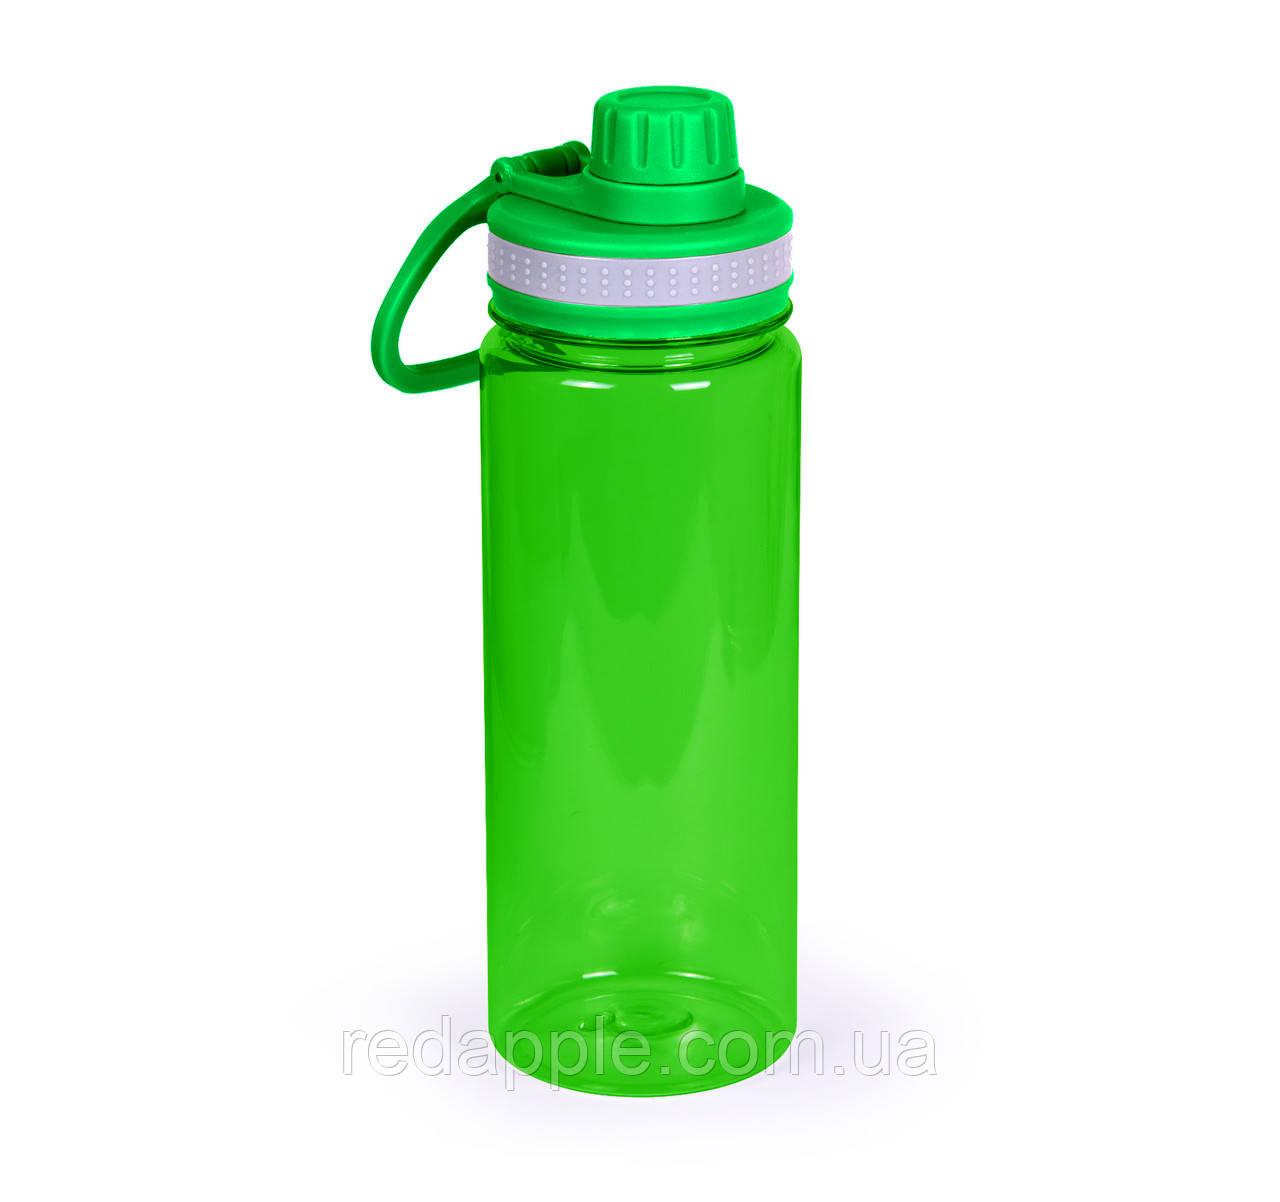 Пляшка для пиття Active, ТМ Discover